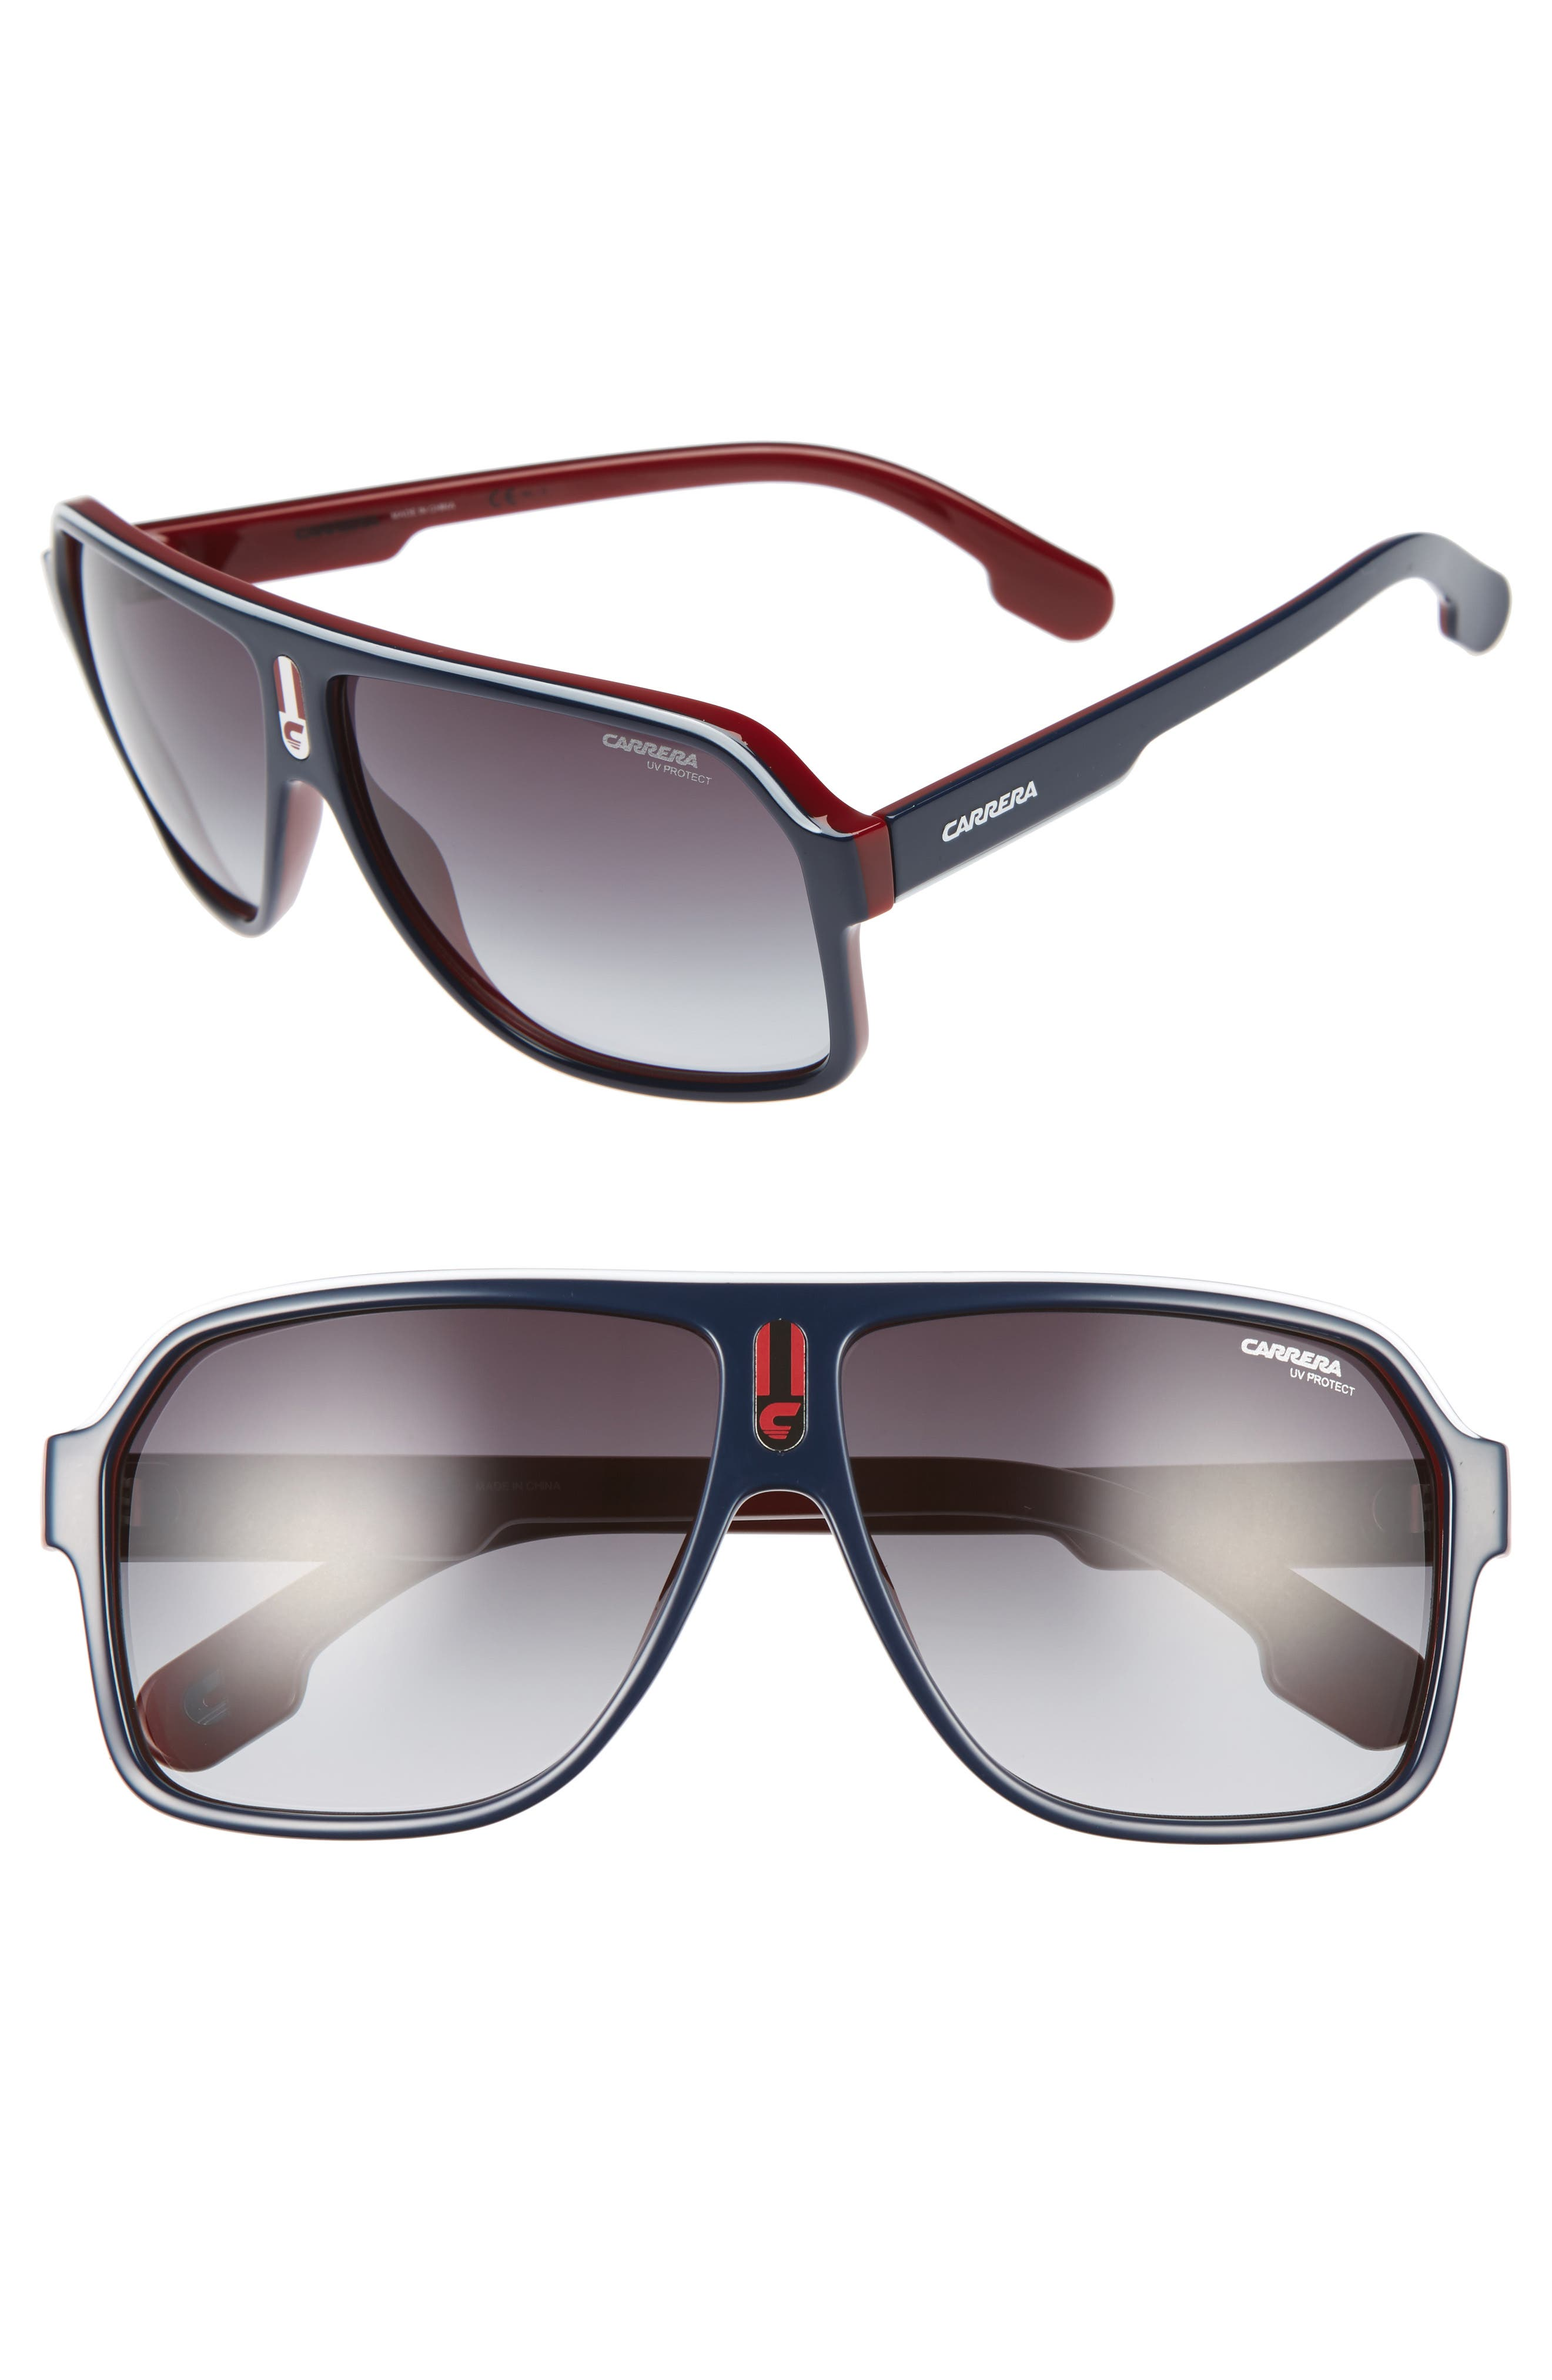 Main Image - Carrera Eyewear 62mm Aviator Sunglasses